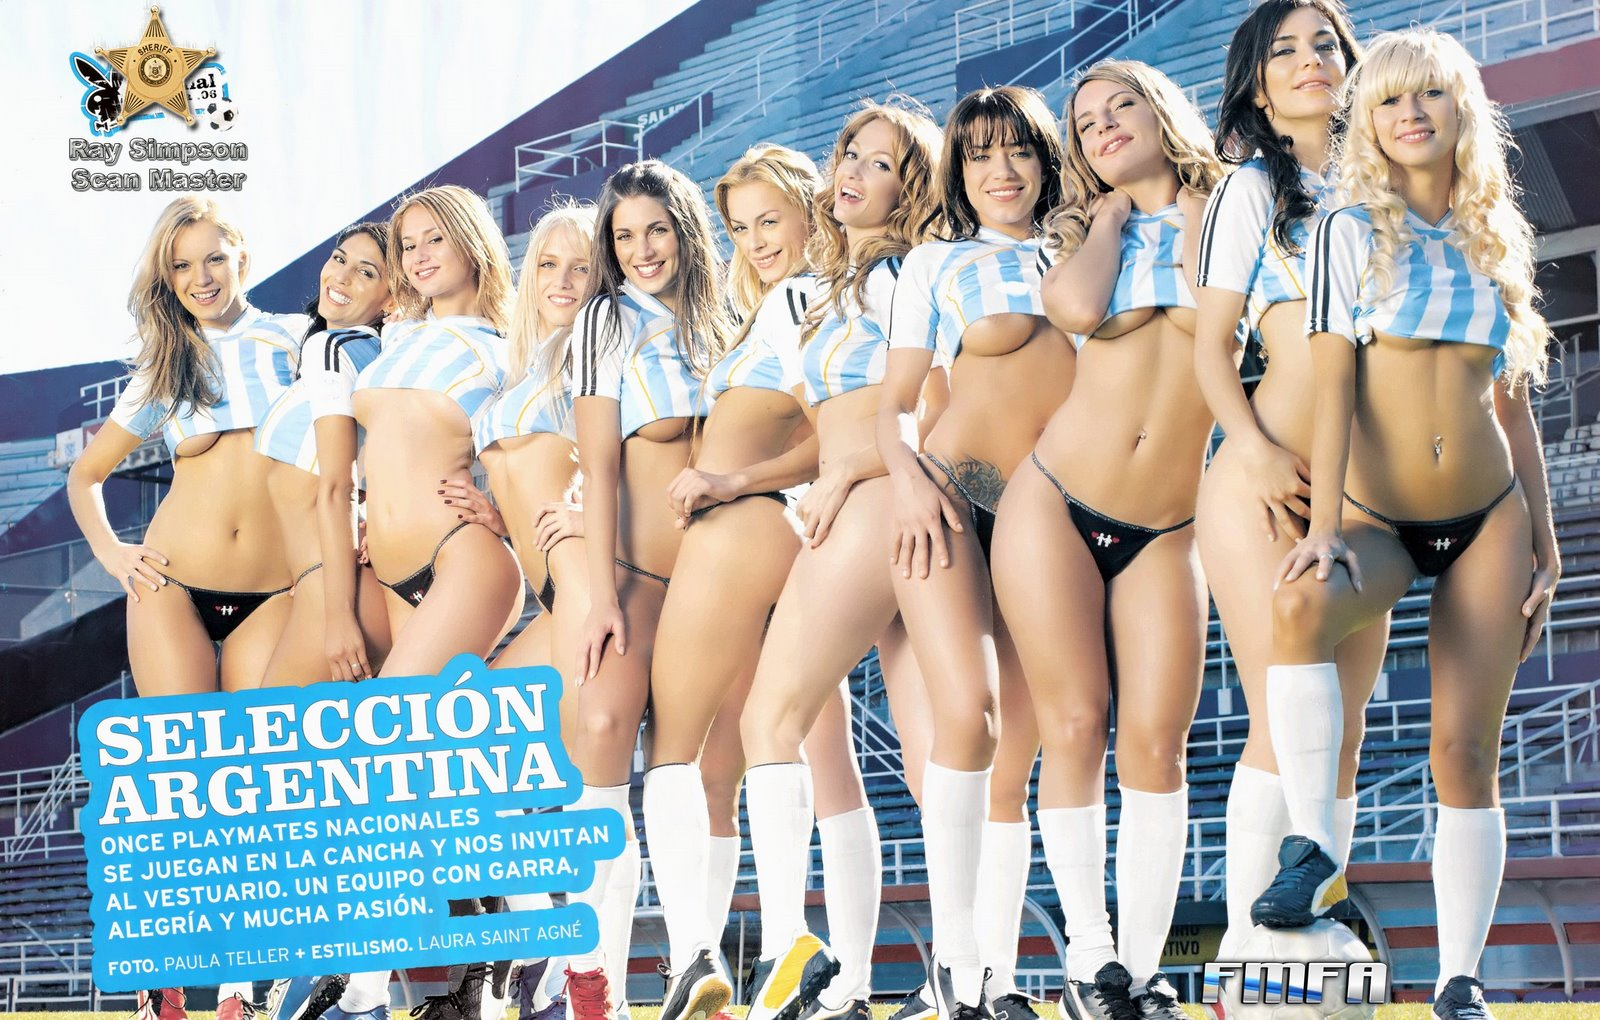 mujeres argentinas caseras: